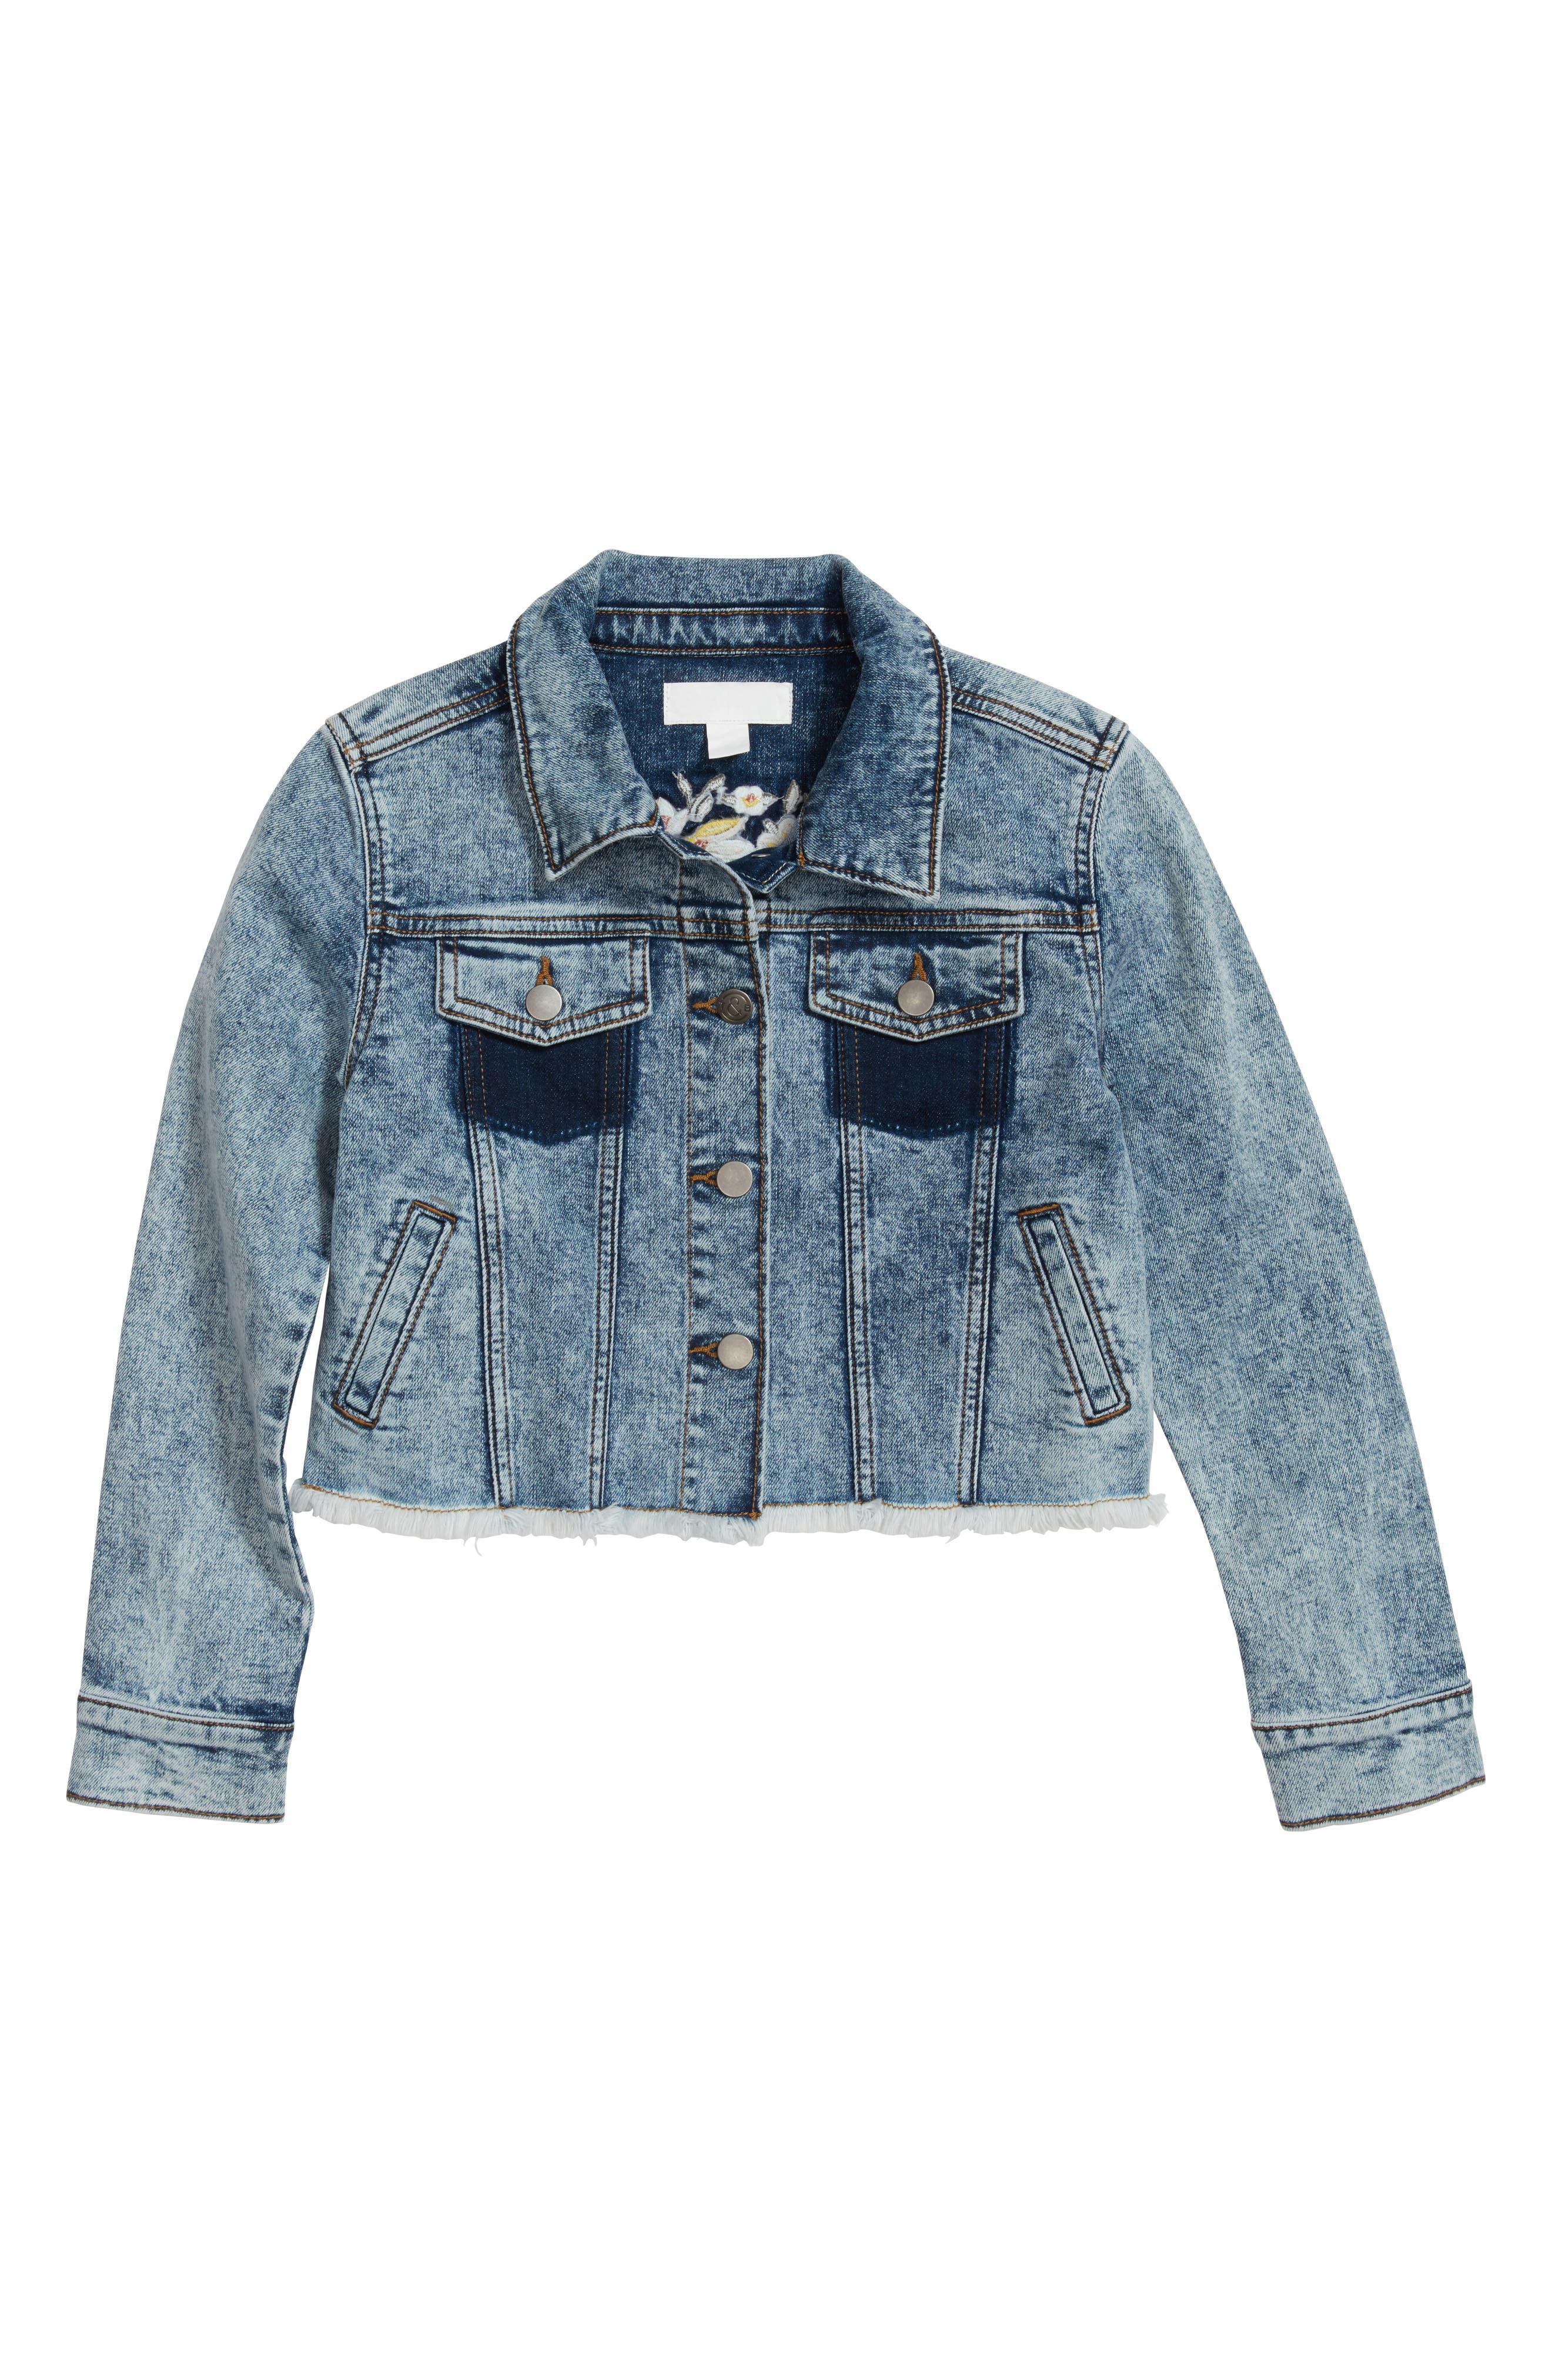 Main Image - Treasure & Bond Embroidered Crop Denim Jacket (Big Girls)